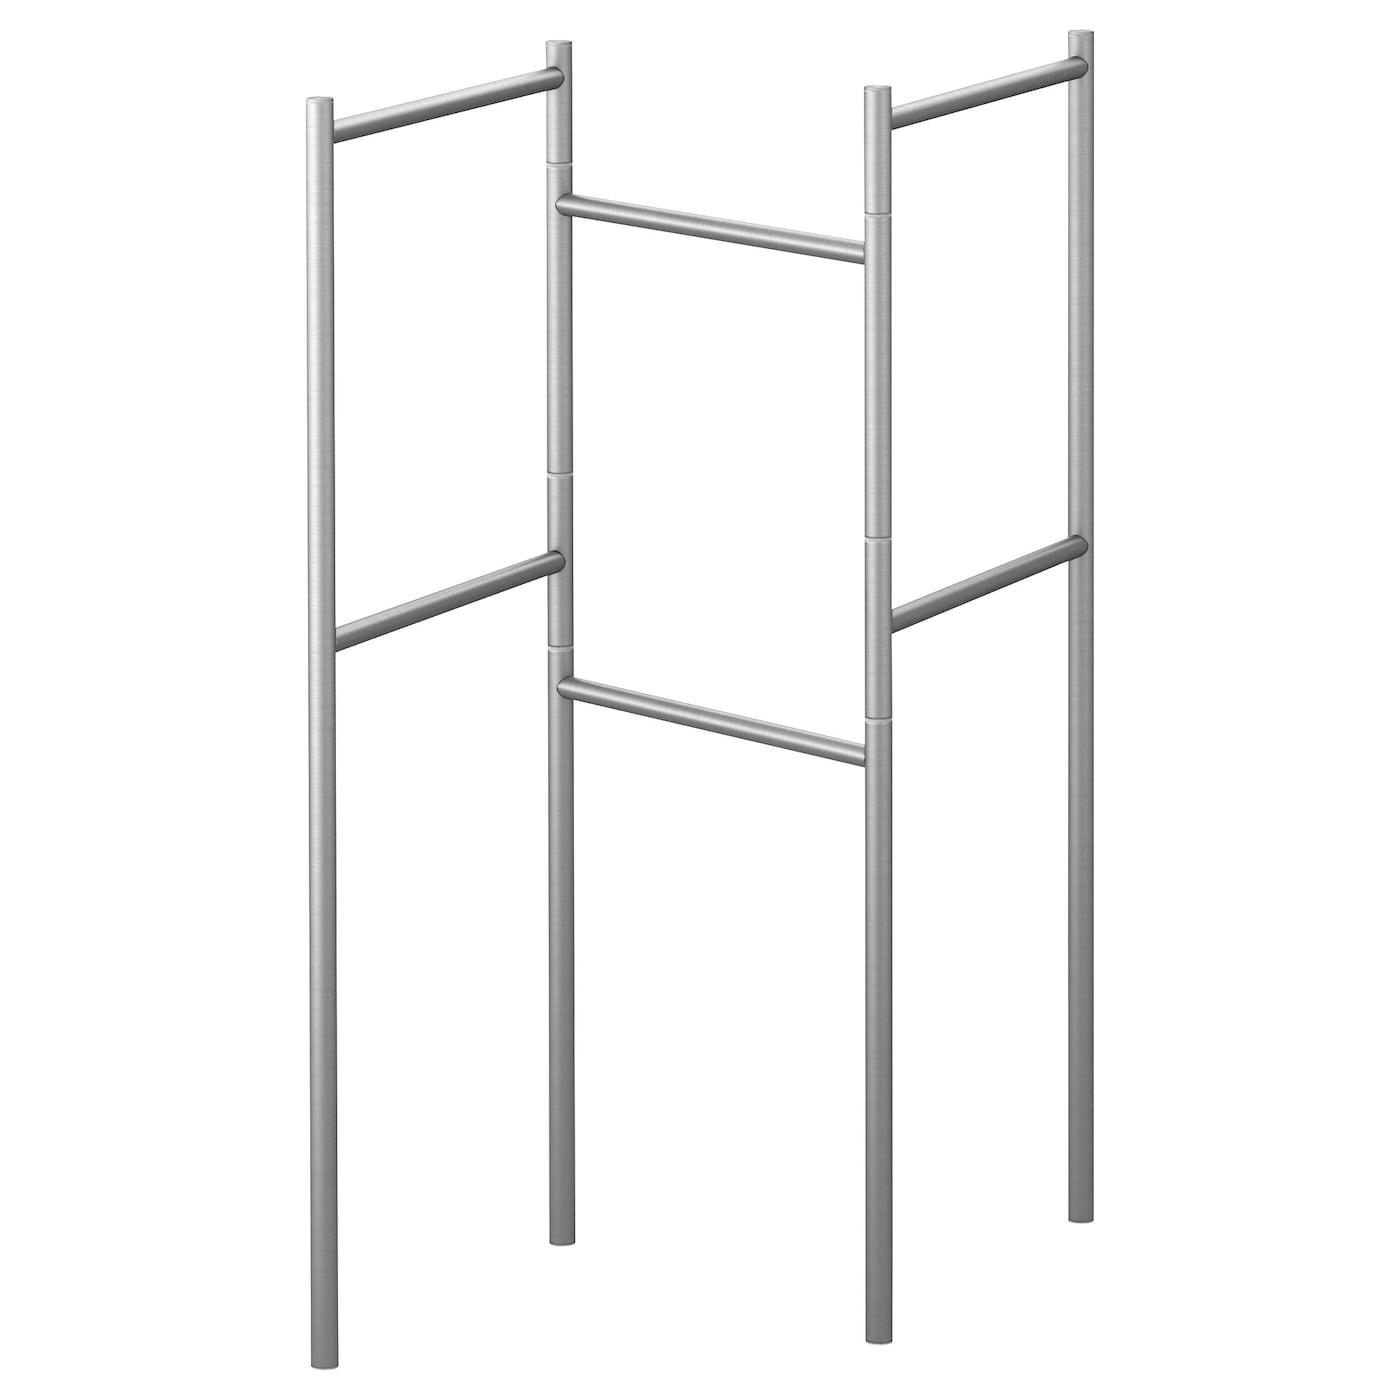 Towel rail towel rack ikea - Porta asciugamani ikea ...